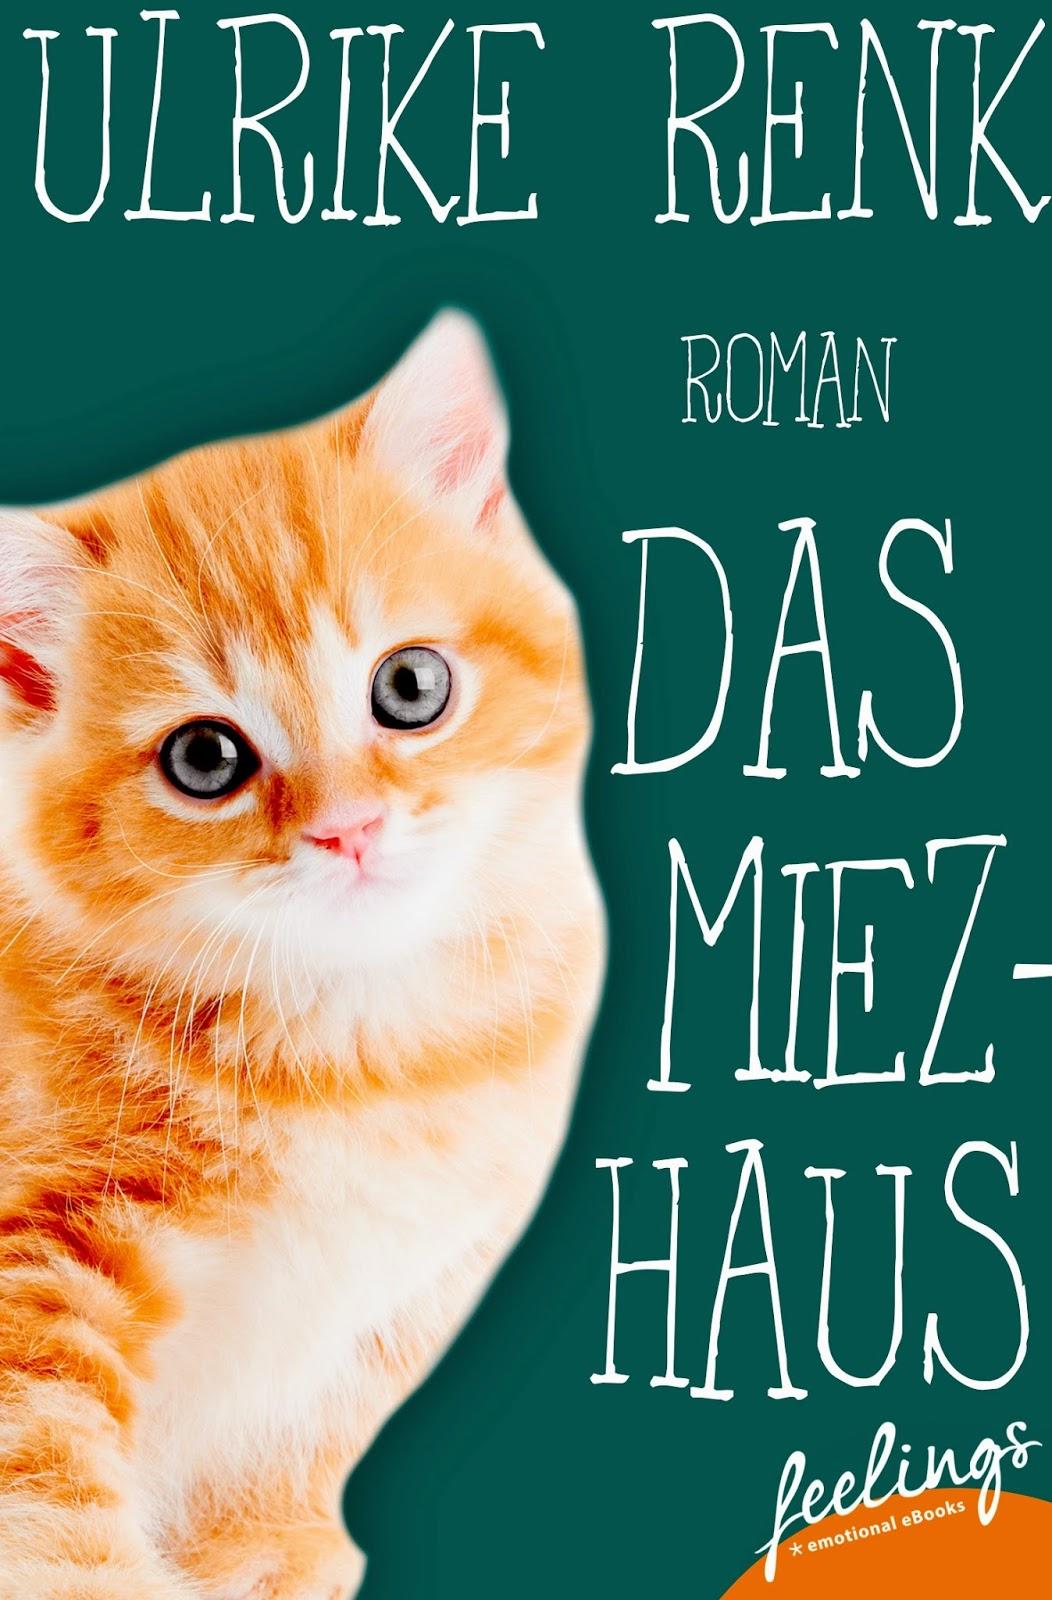 http://www.droemer-knaur.de/ebooks/7978414/das-miezhaus